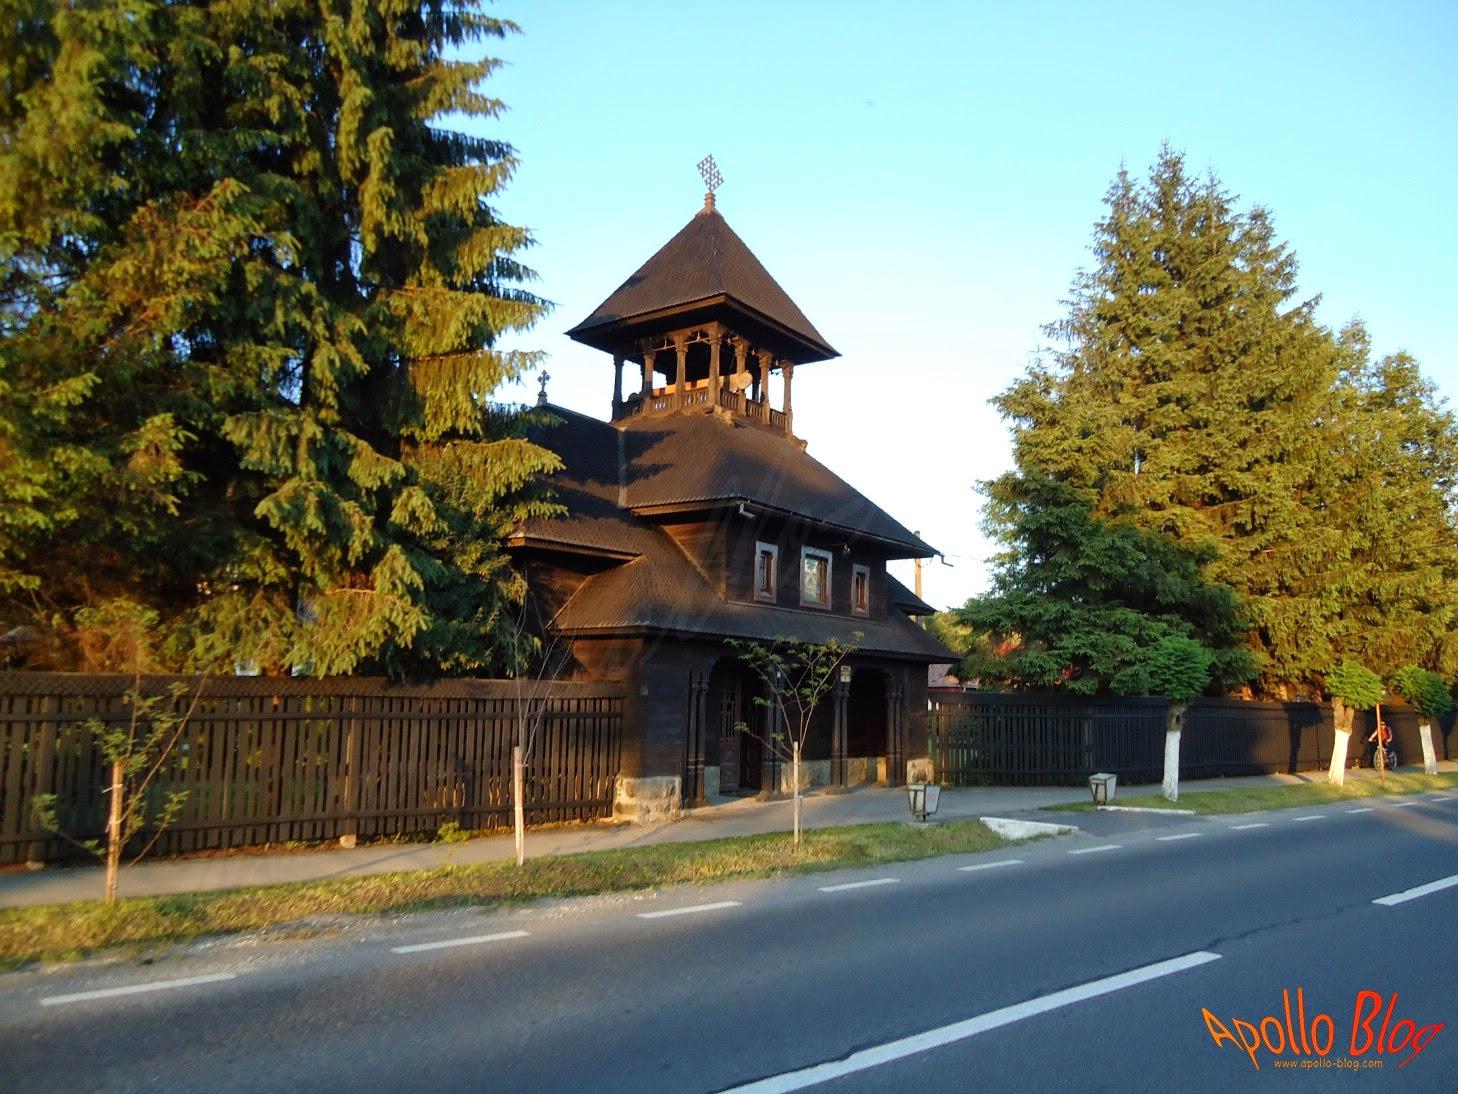 Intrare manastirea Sf. Ilie